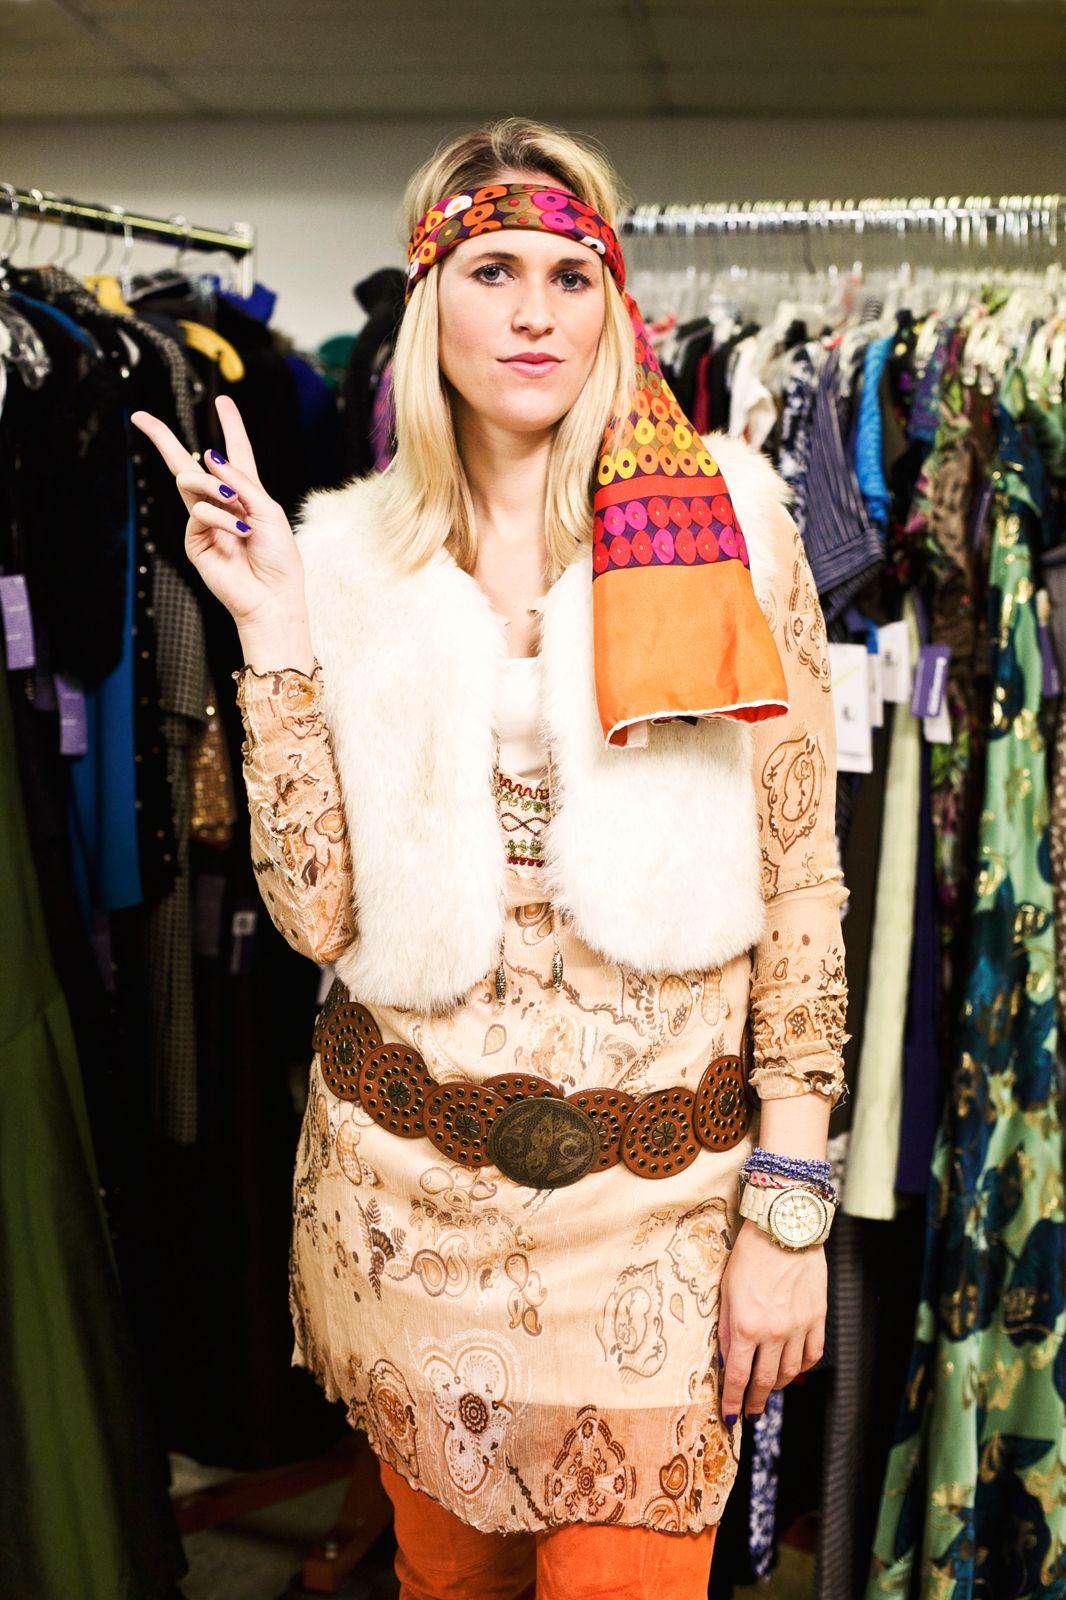 Thrift Store Costumes Vintage Halloween Costume Ideas